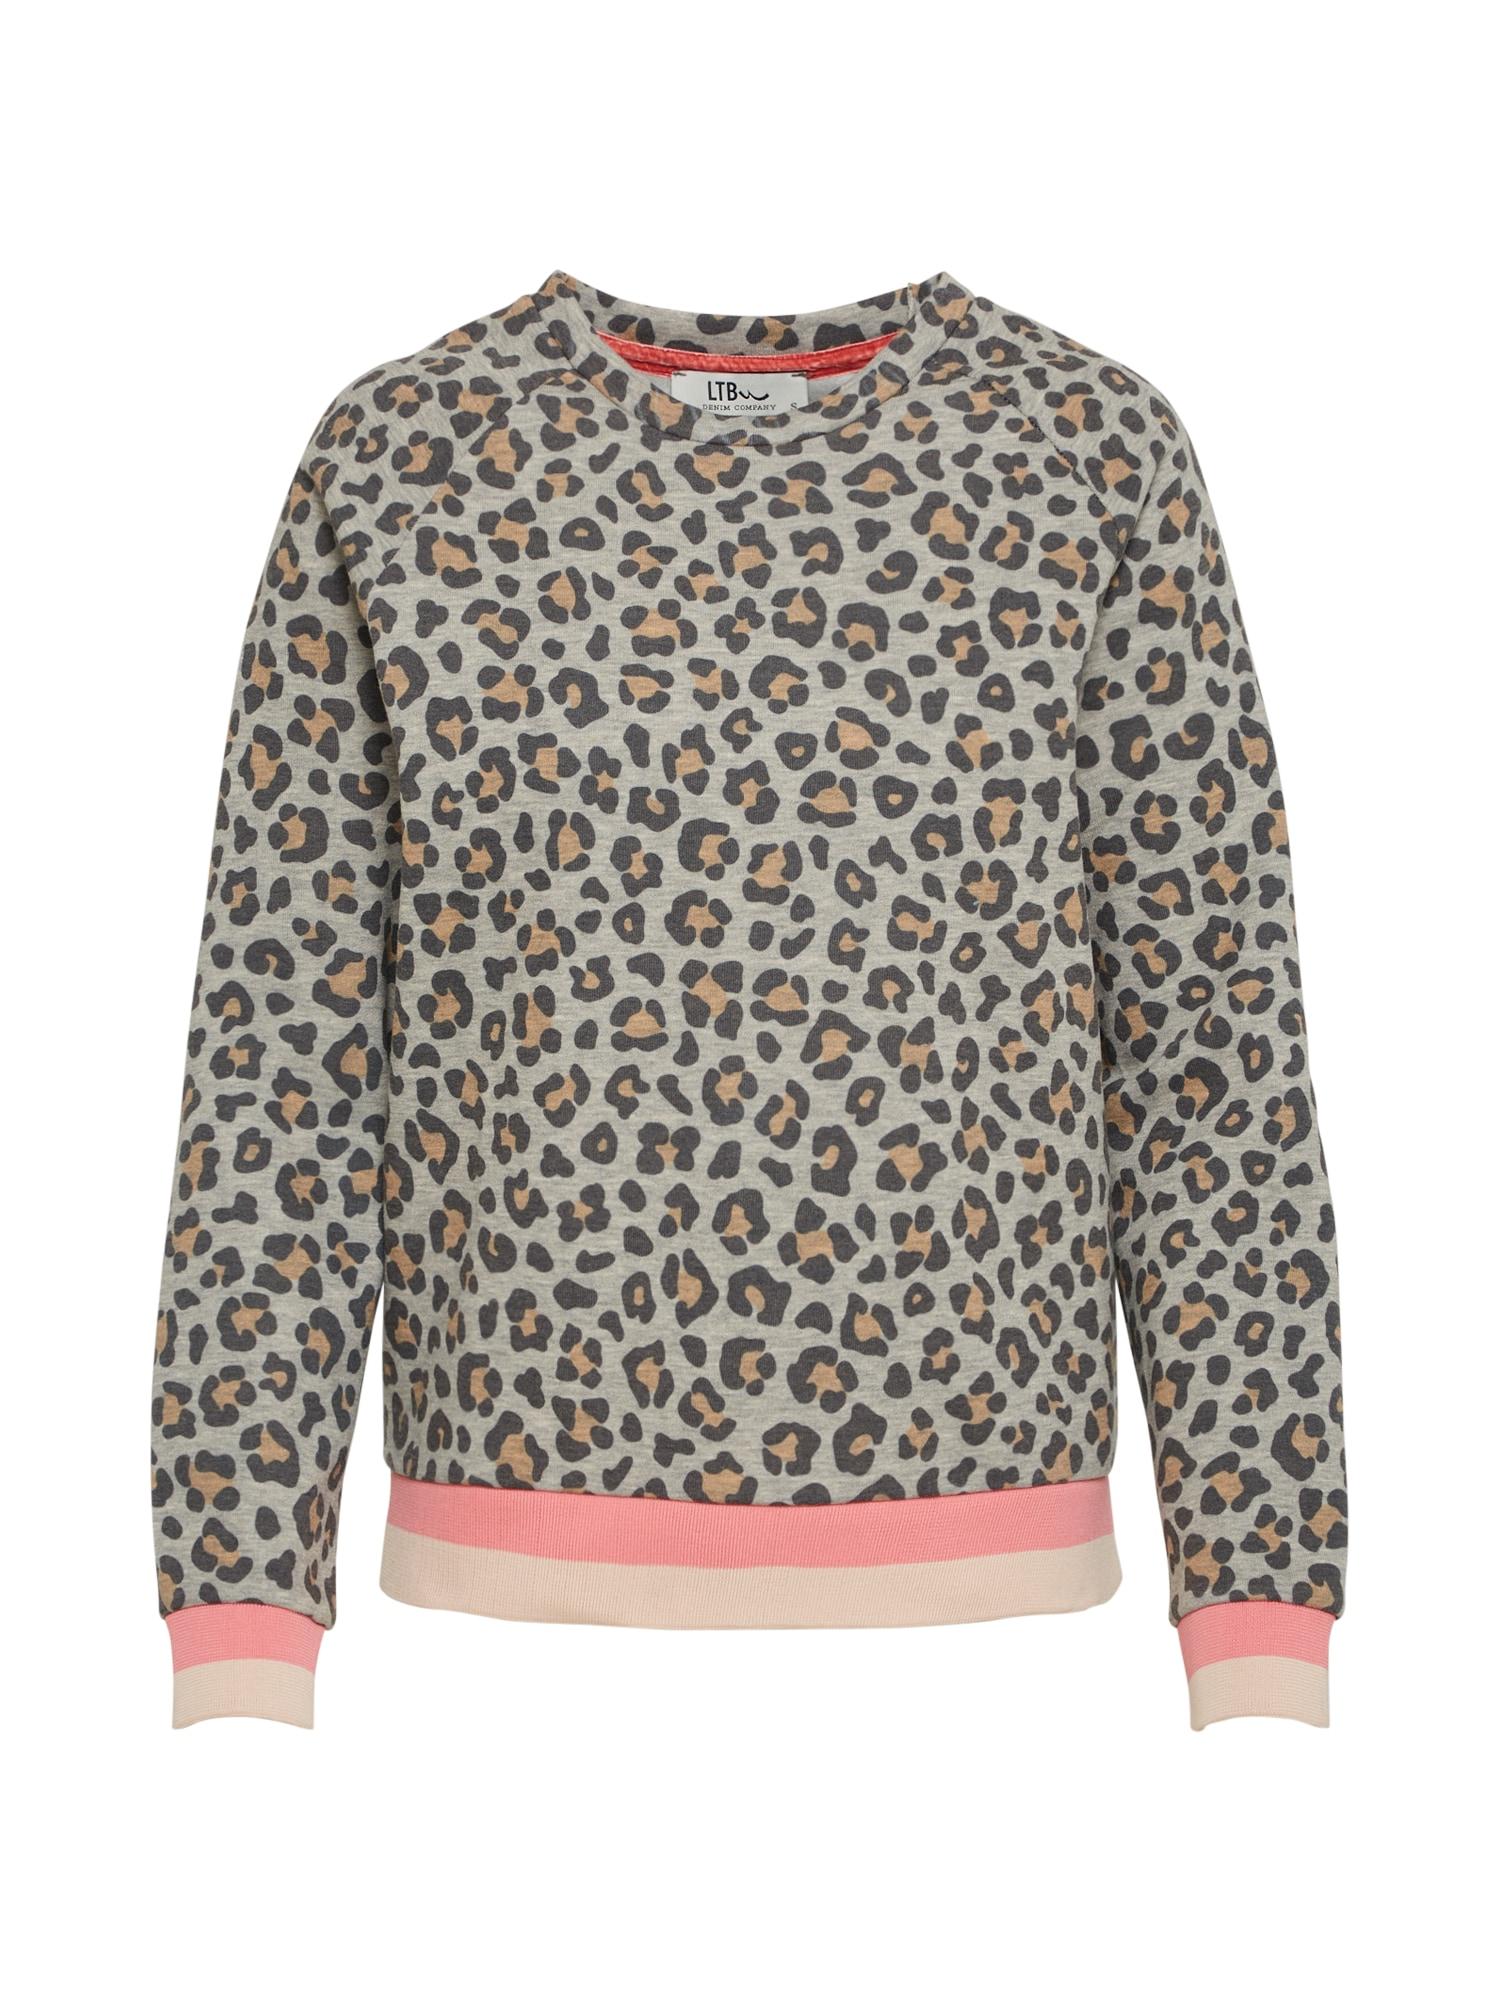 LTB Damen Pullover WETASO S T braun,grau,pink | 08697600733951